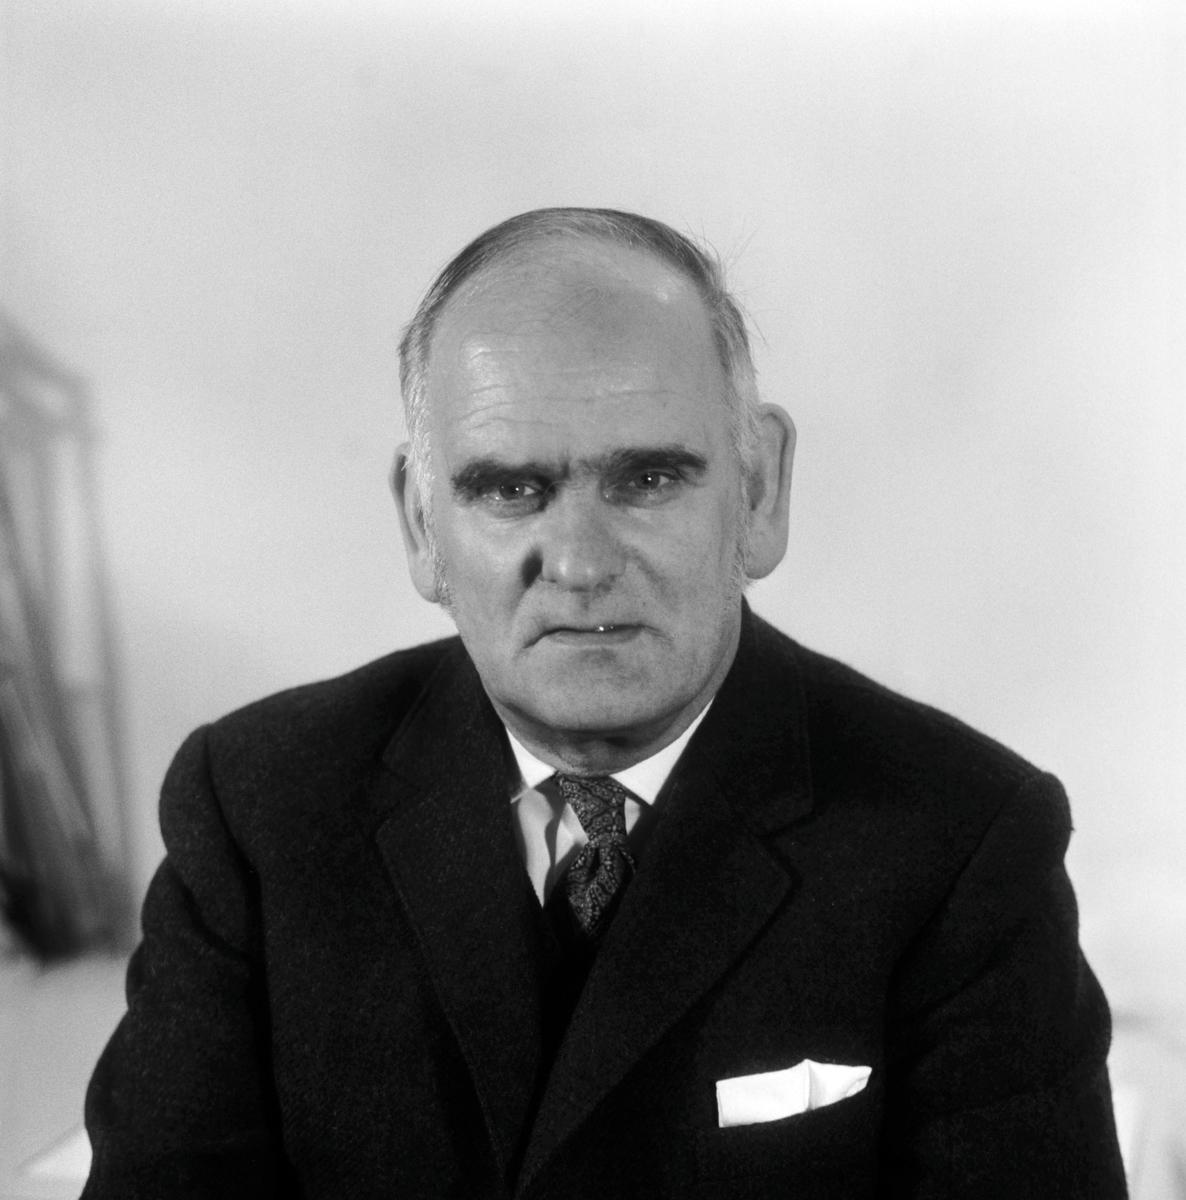 Bengt Holmqvist